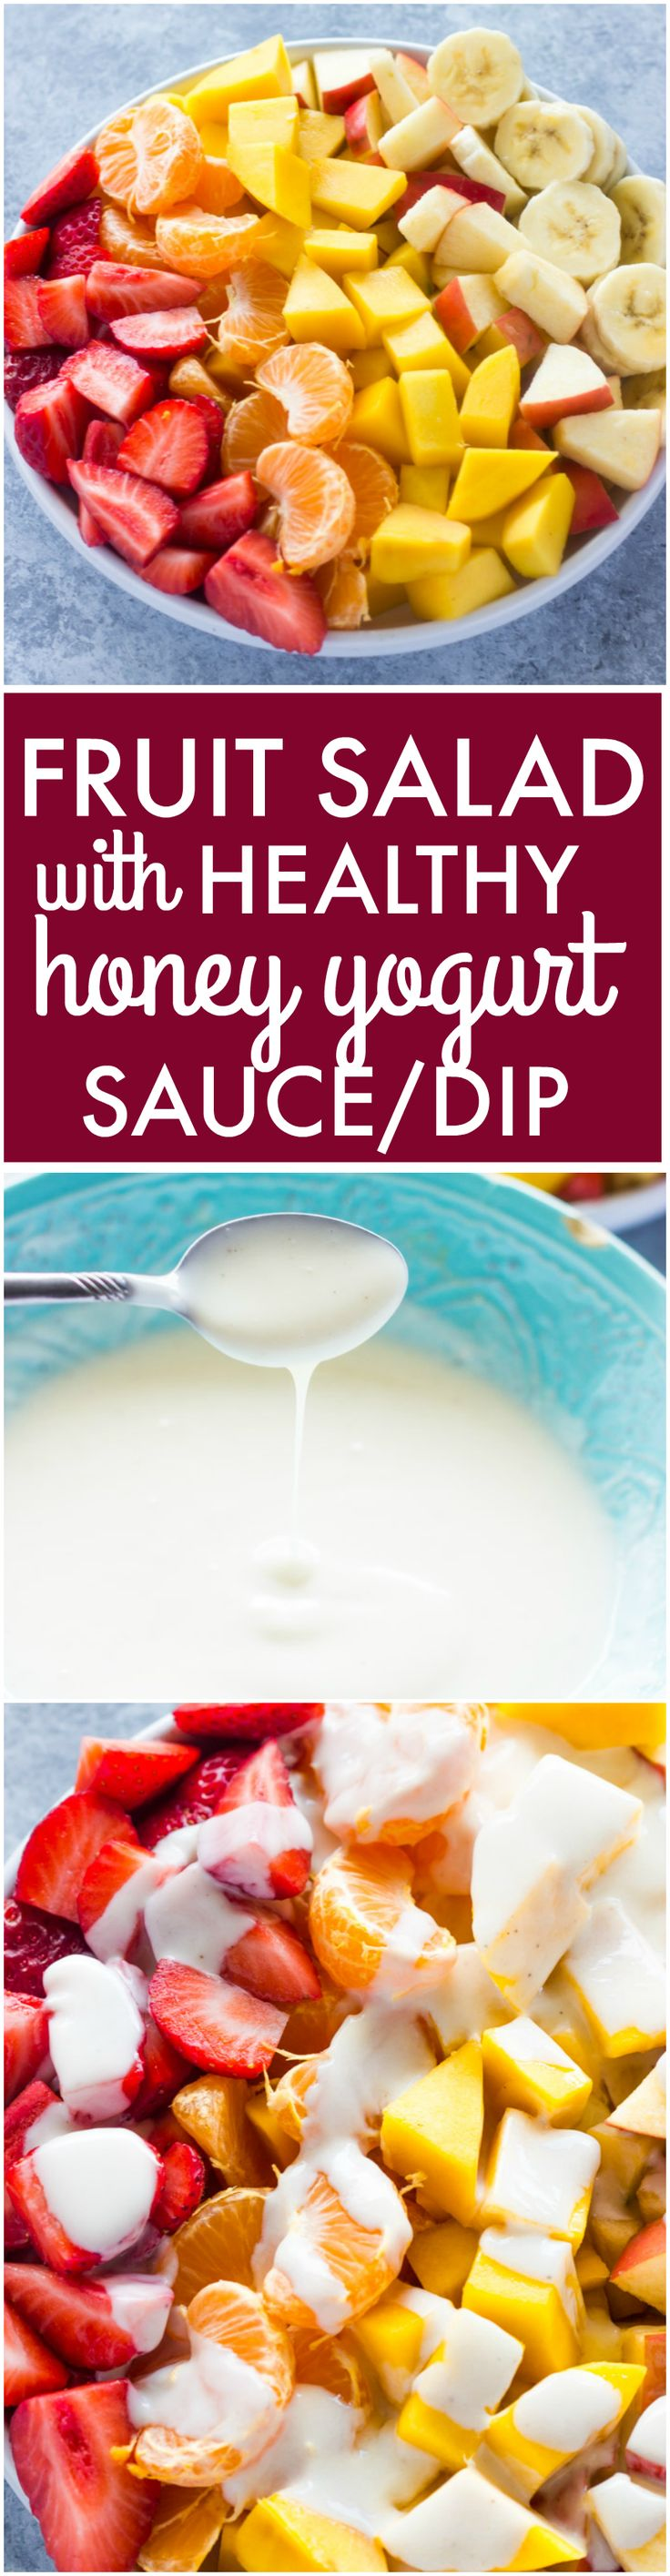 Fruit Salad with Healthy Honey Yogurt Sauce (yogurt fruit snacks)